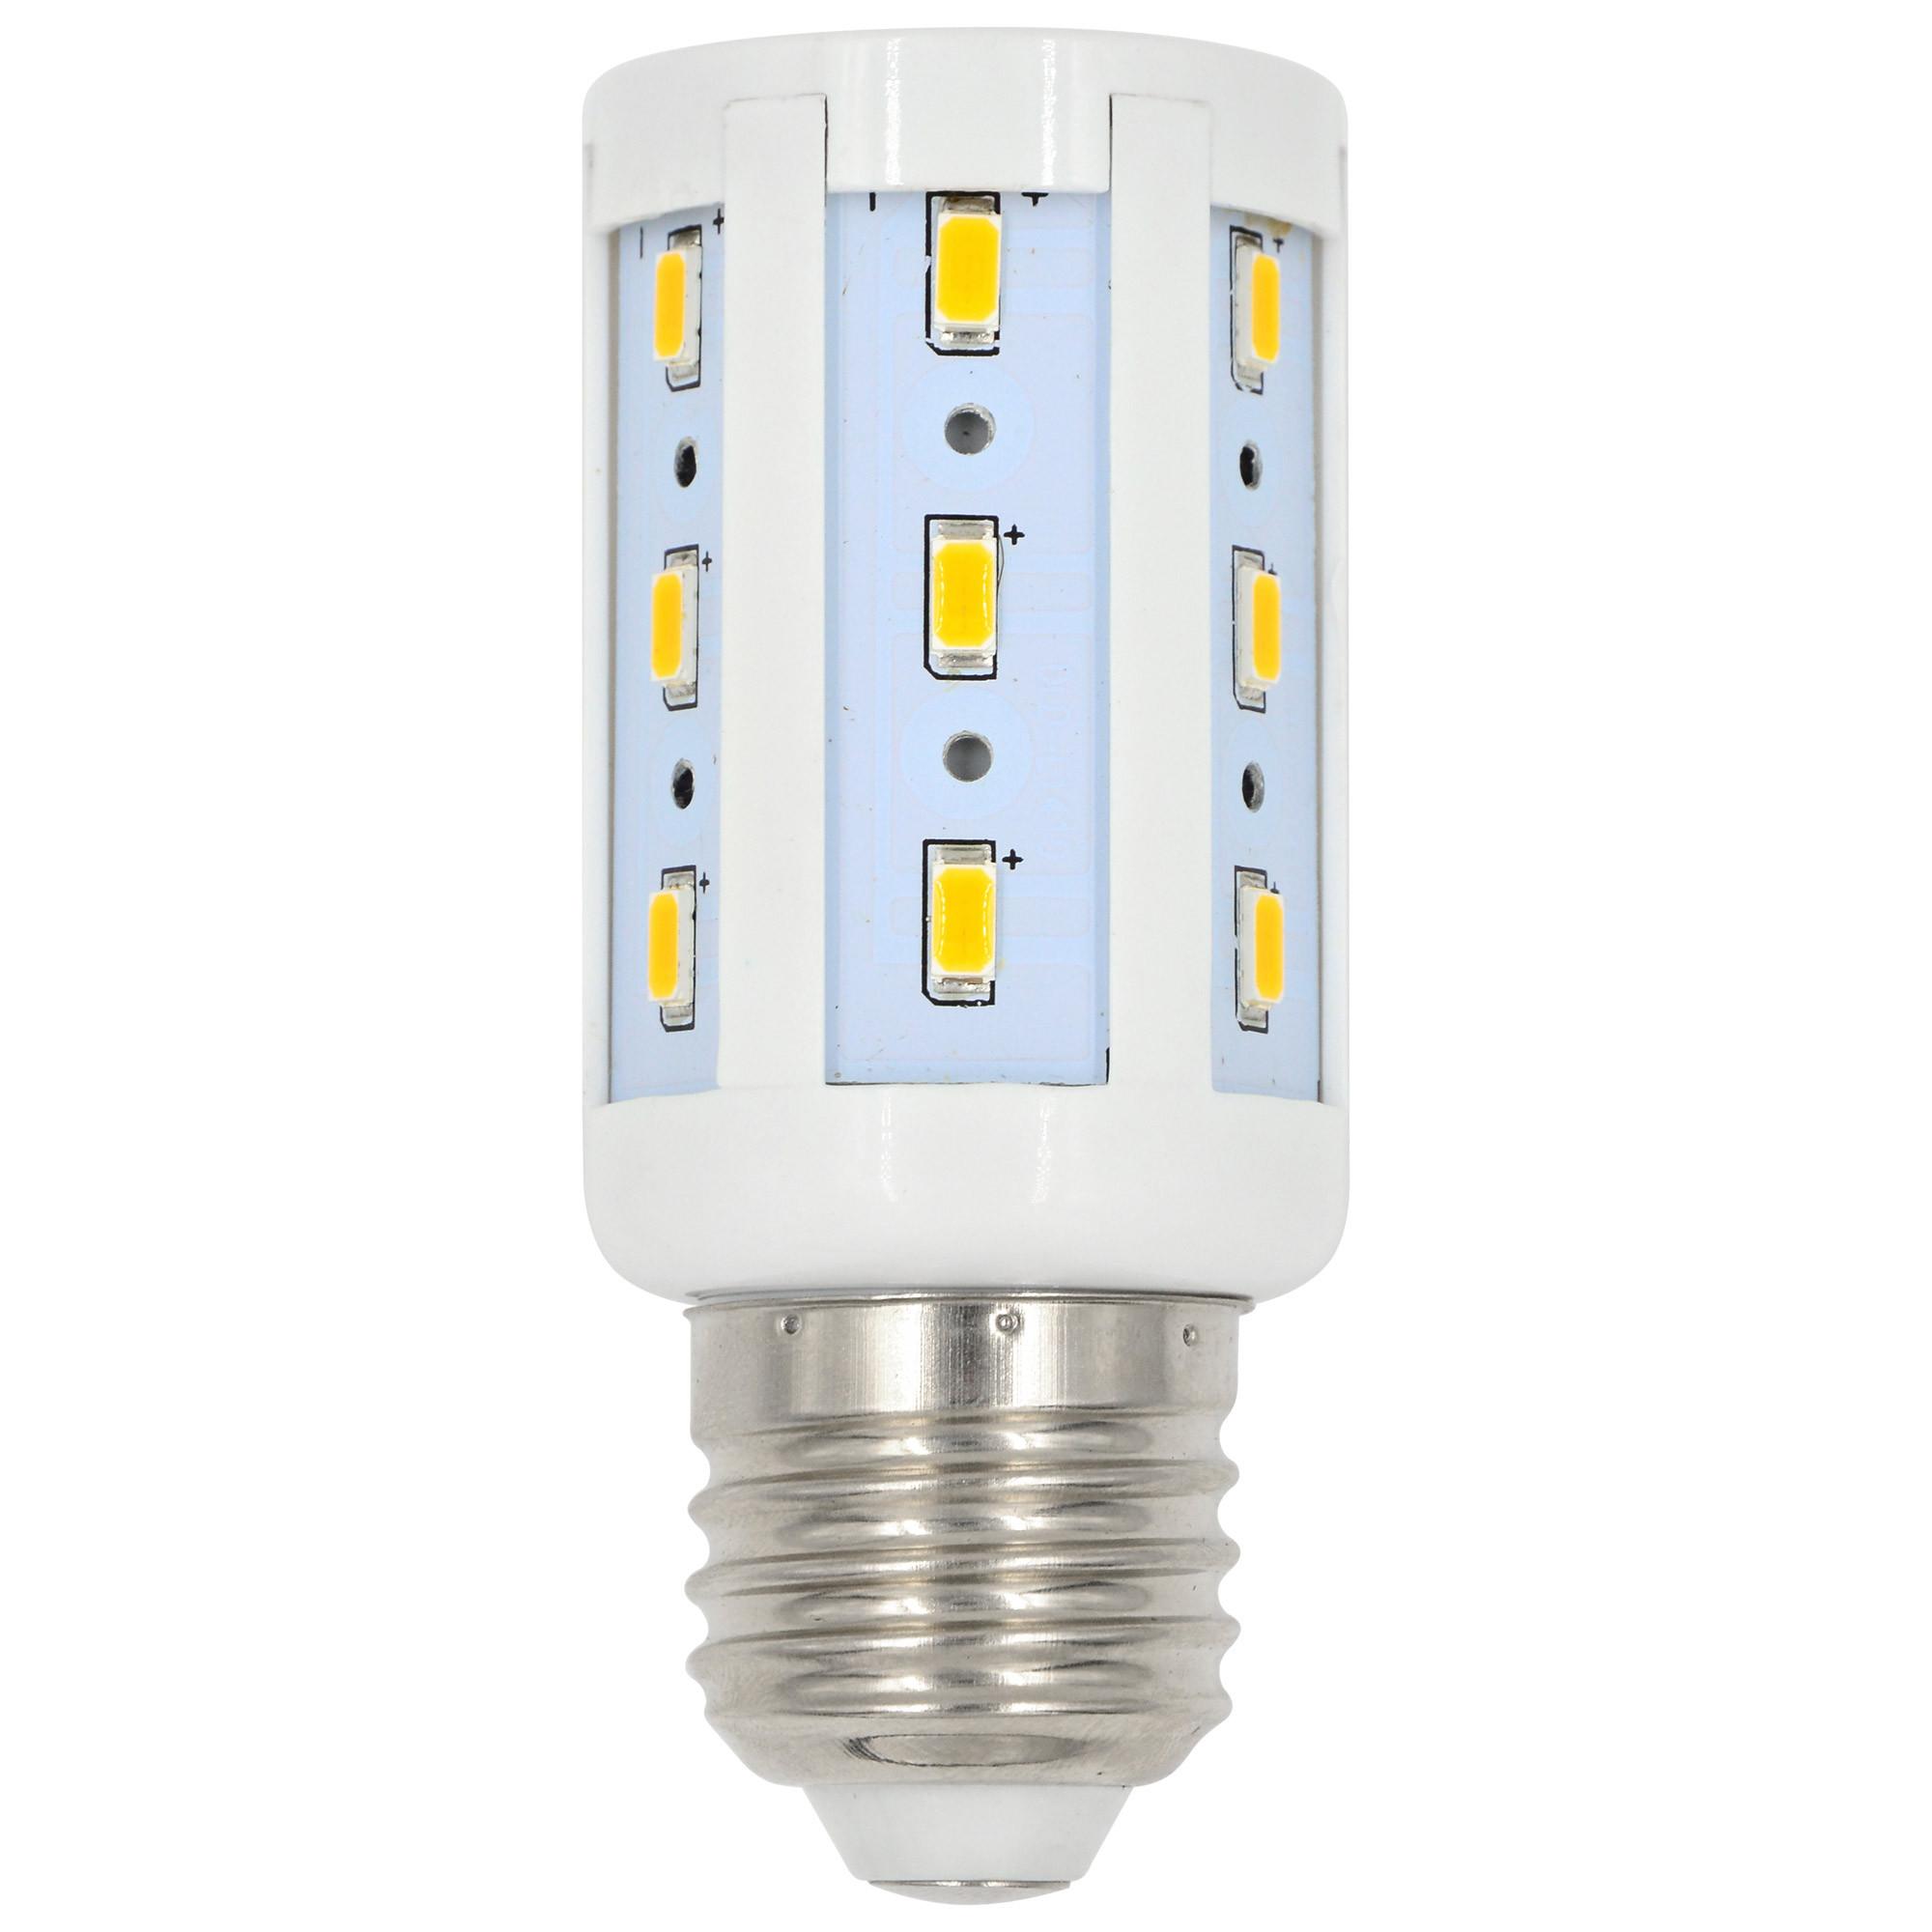 MENGS® E27 5W LED Corn Light 24x 5730 SMD LEDs LED Bulb in Warm White Energy-Saving Lamp